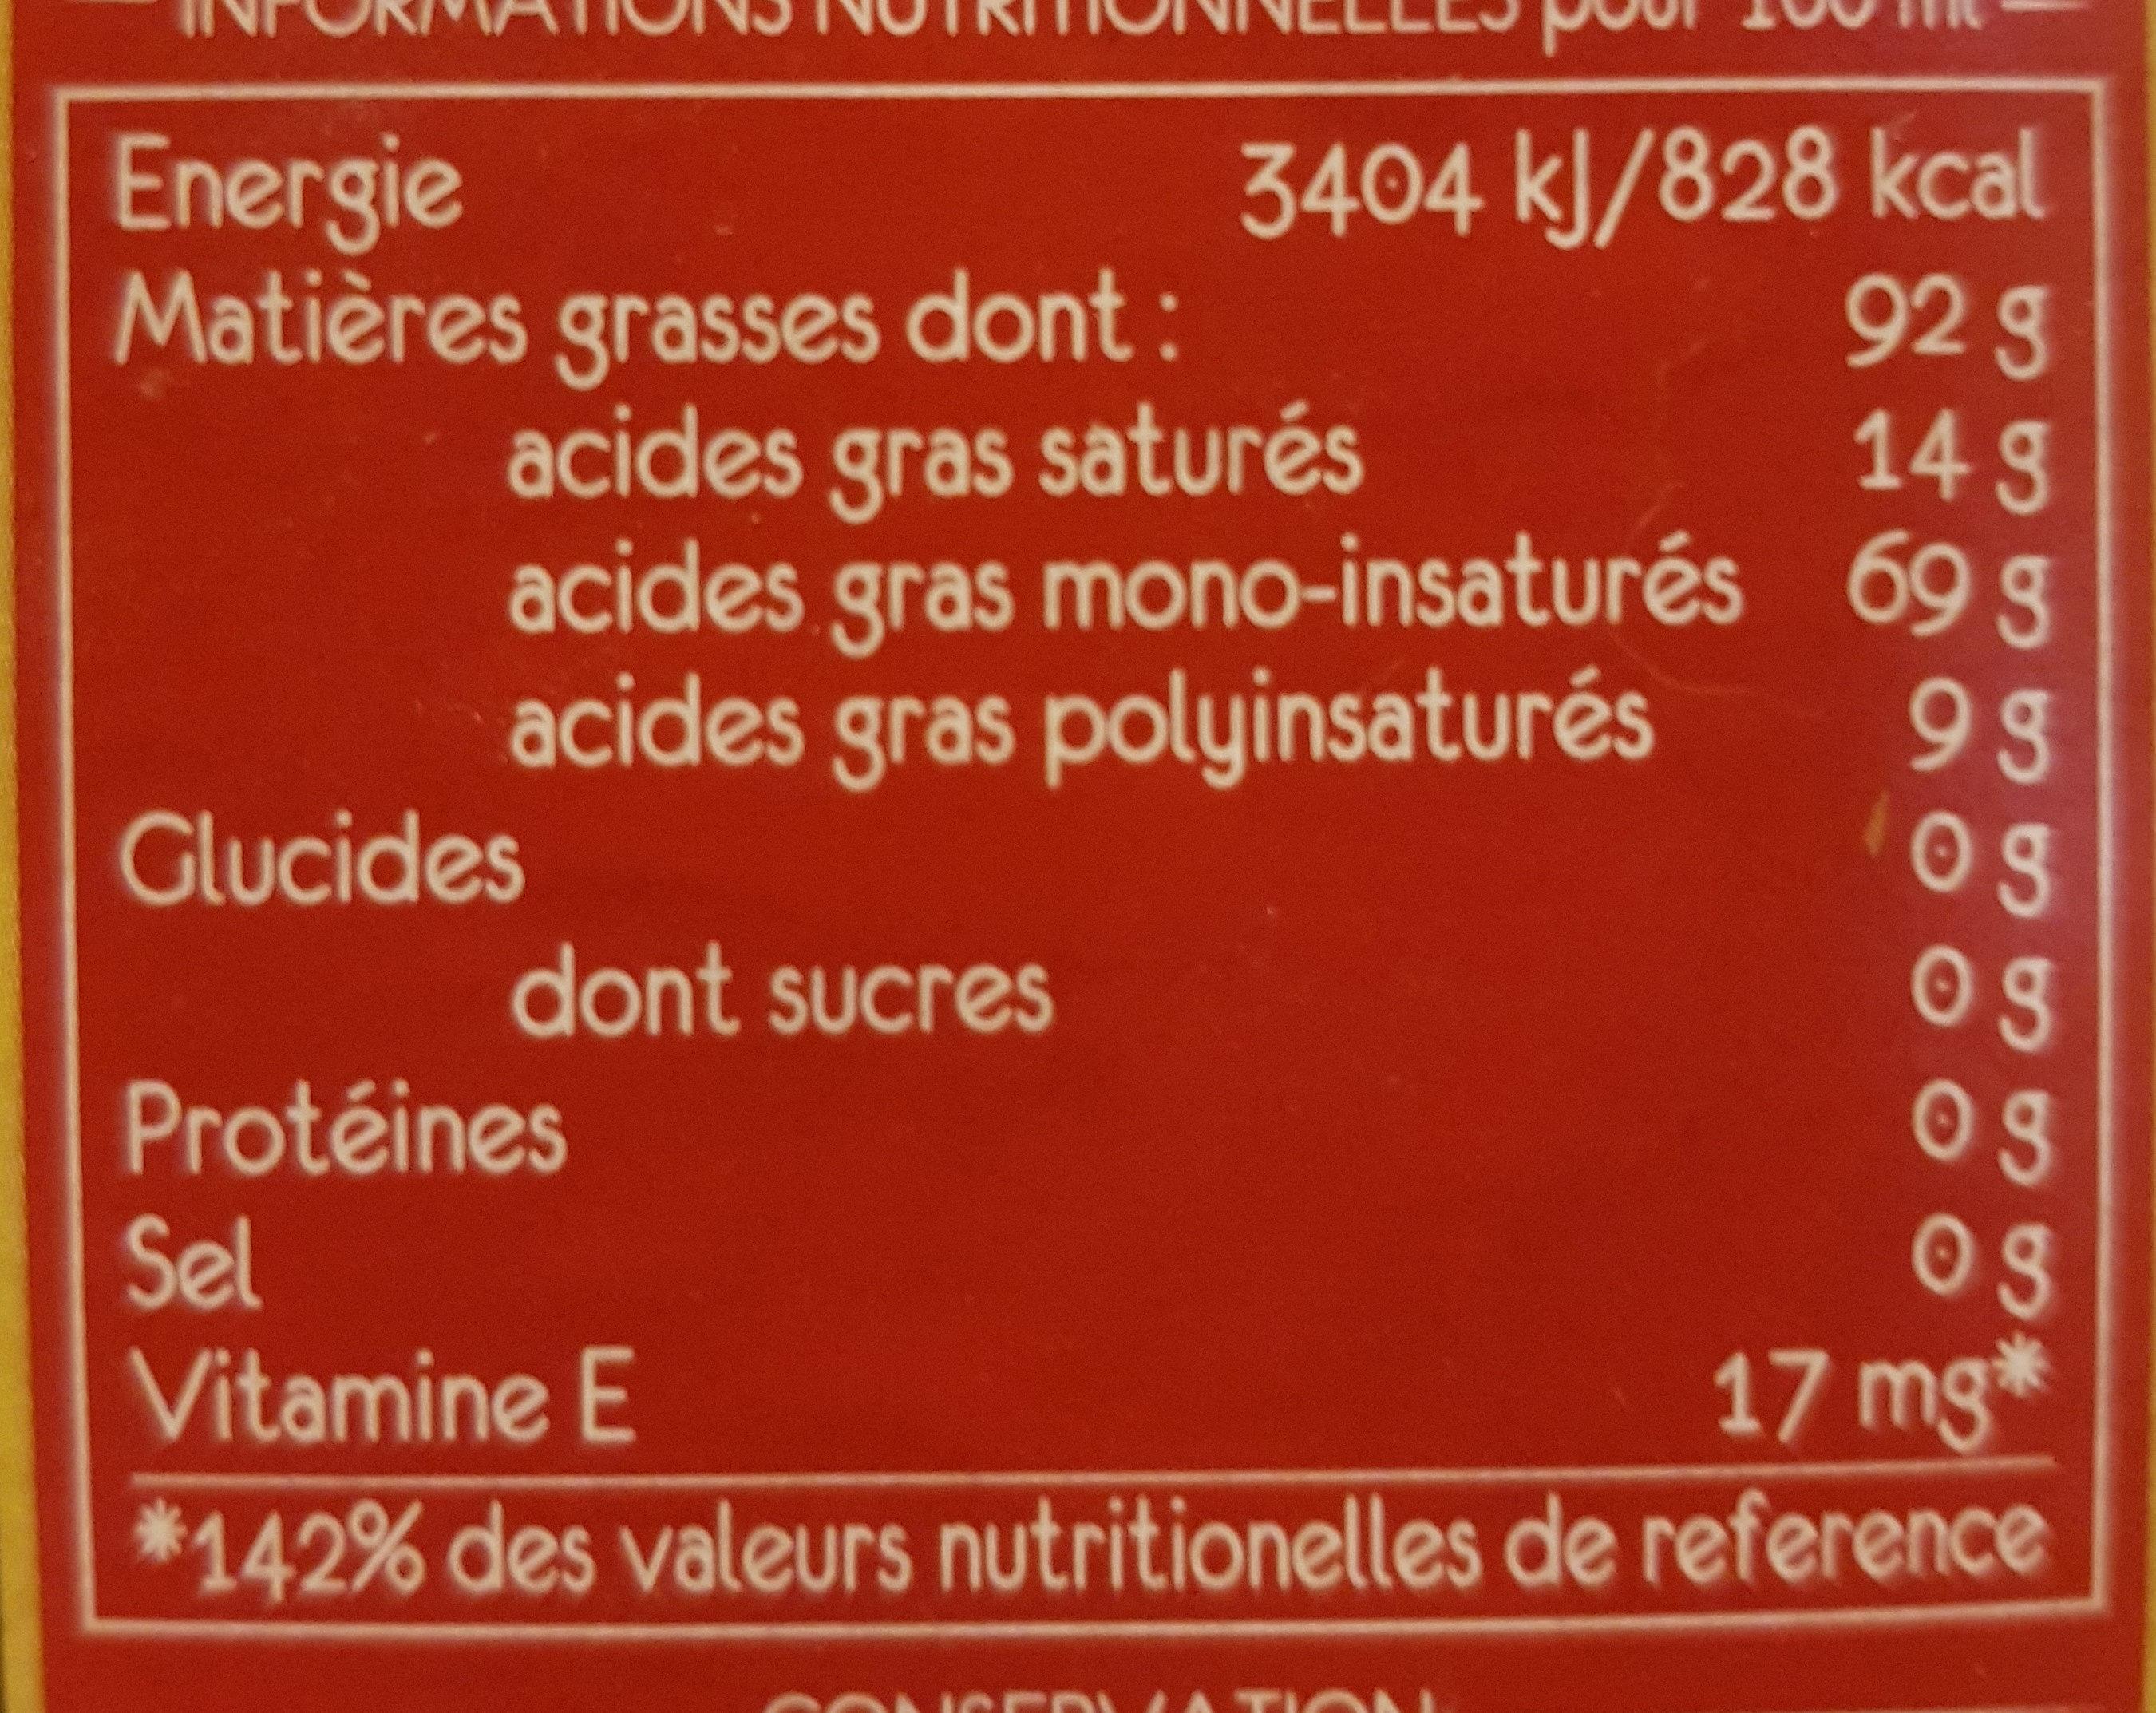 Huile d'olive vierge extra - Valori nutrizionali - it